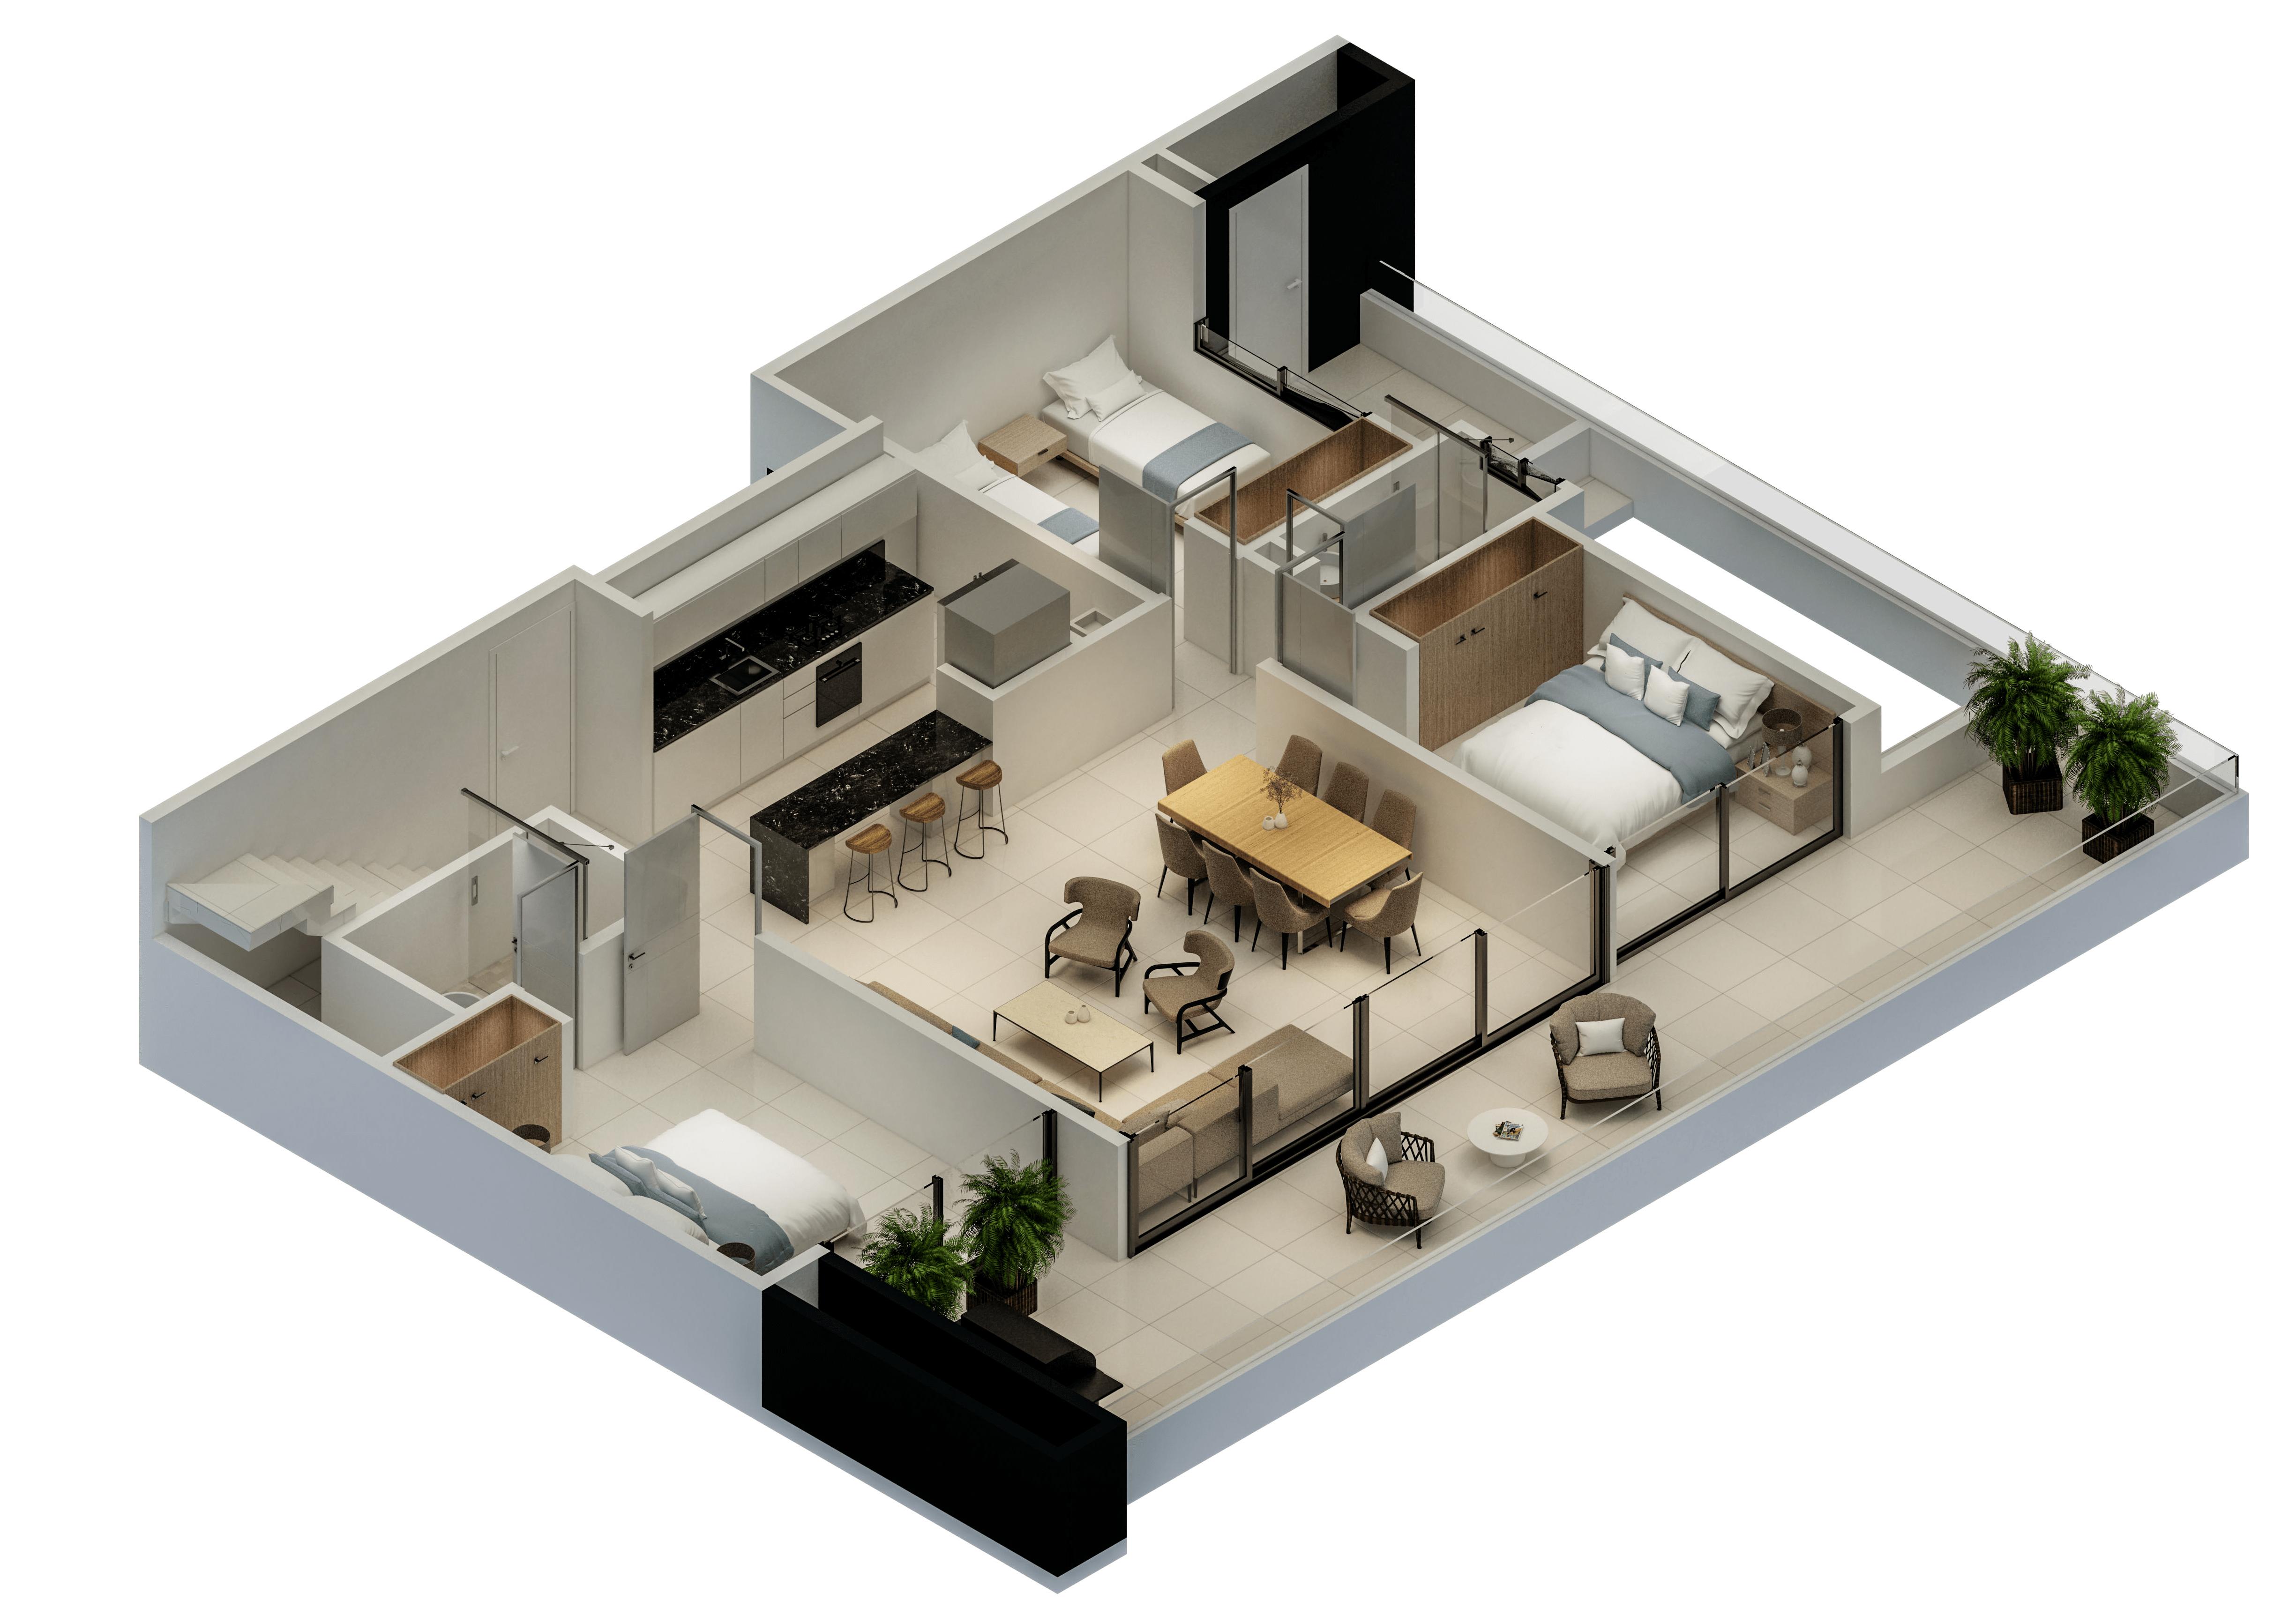 penthouse_5_alcobas_isometrica_0-min